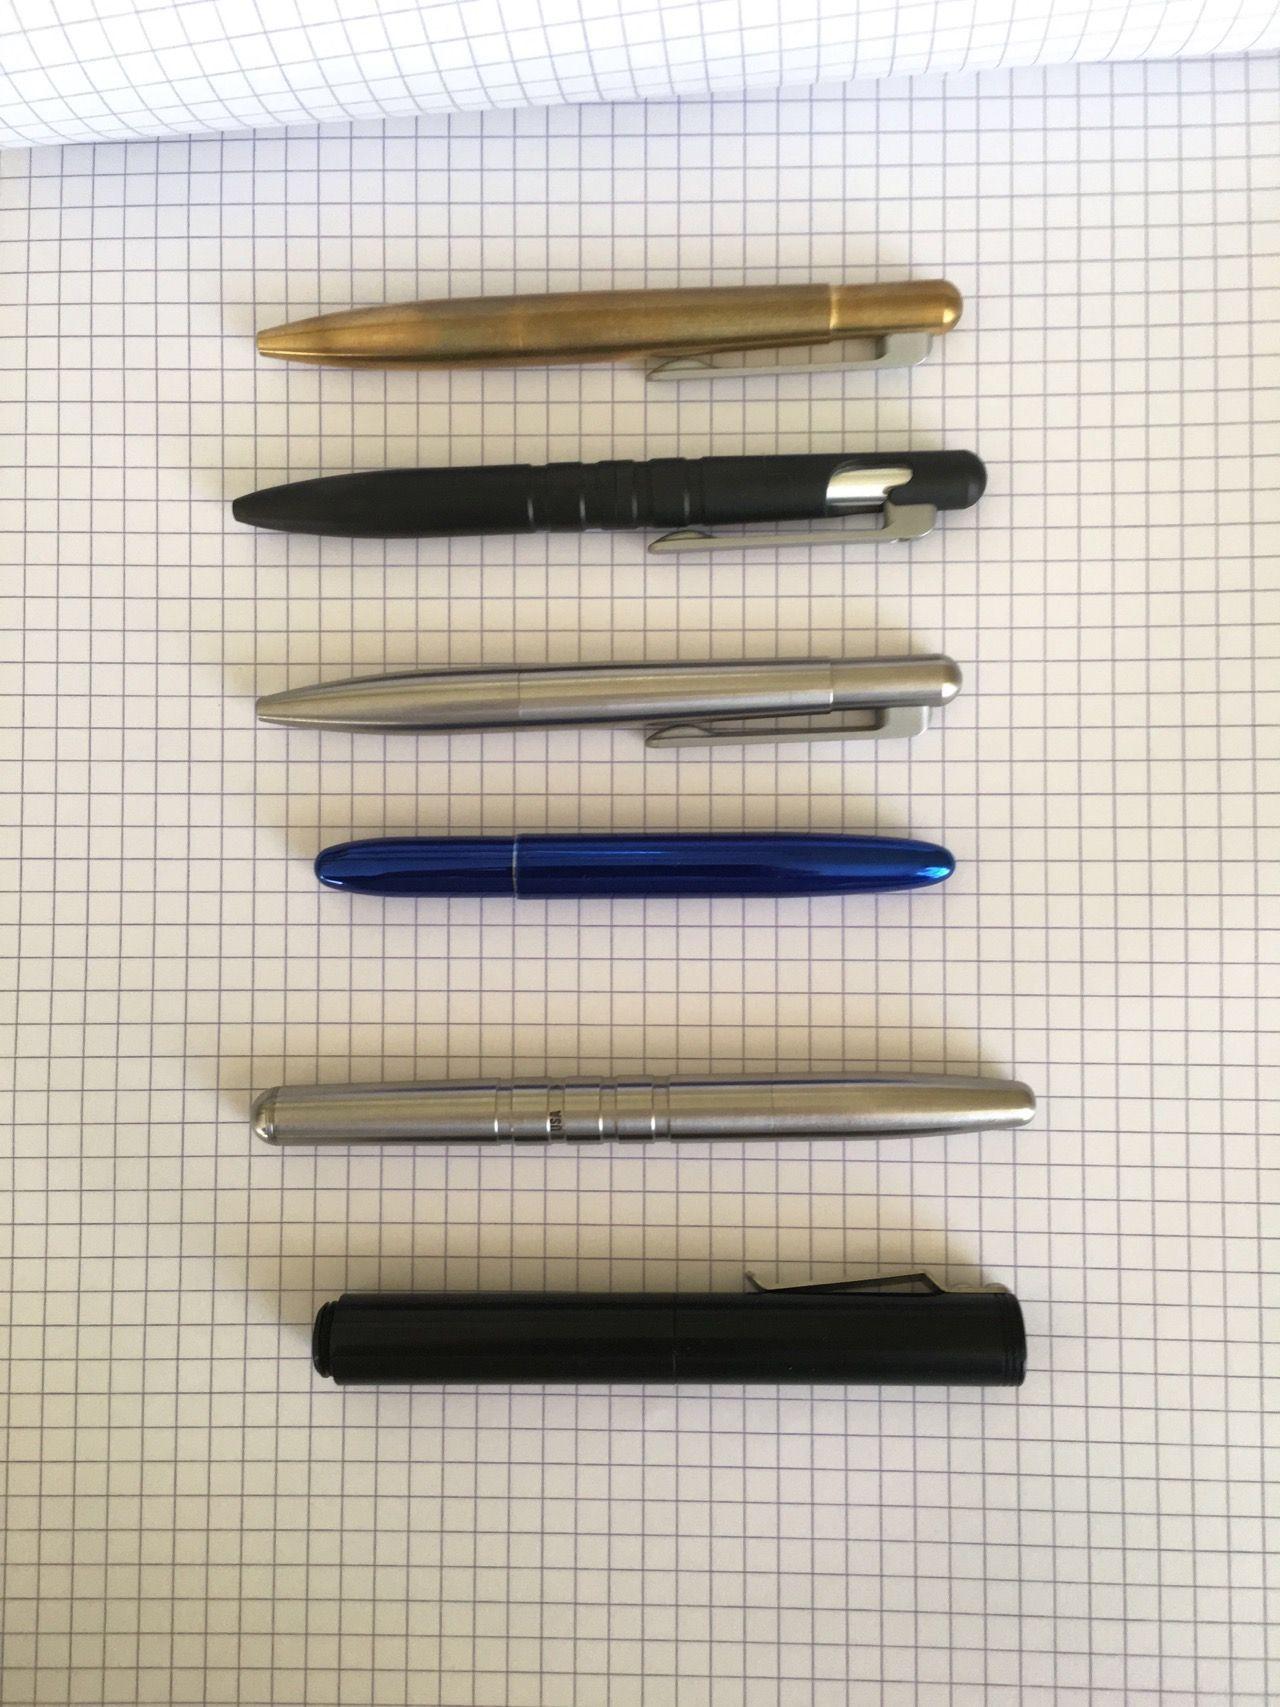 Top to Bottom: Brass Field Pen Compact, Field Pen, Stainless Steel Field Pen Compact, Fisher Bullet, Machine Era Co Pen, Schon DSGN Pen